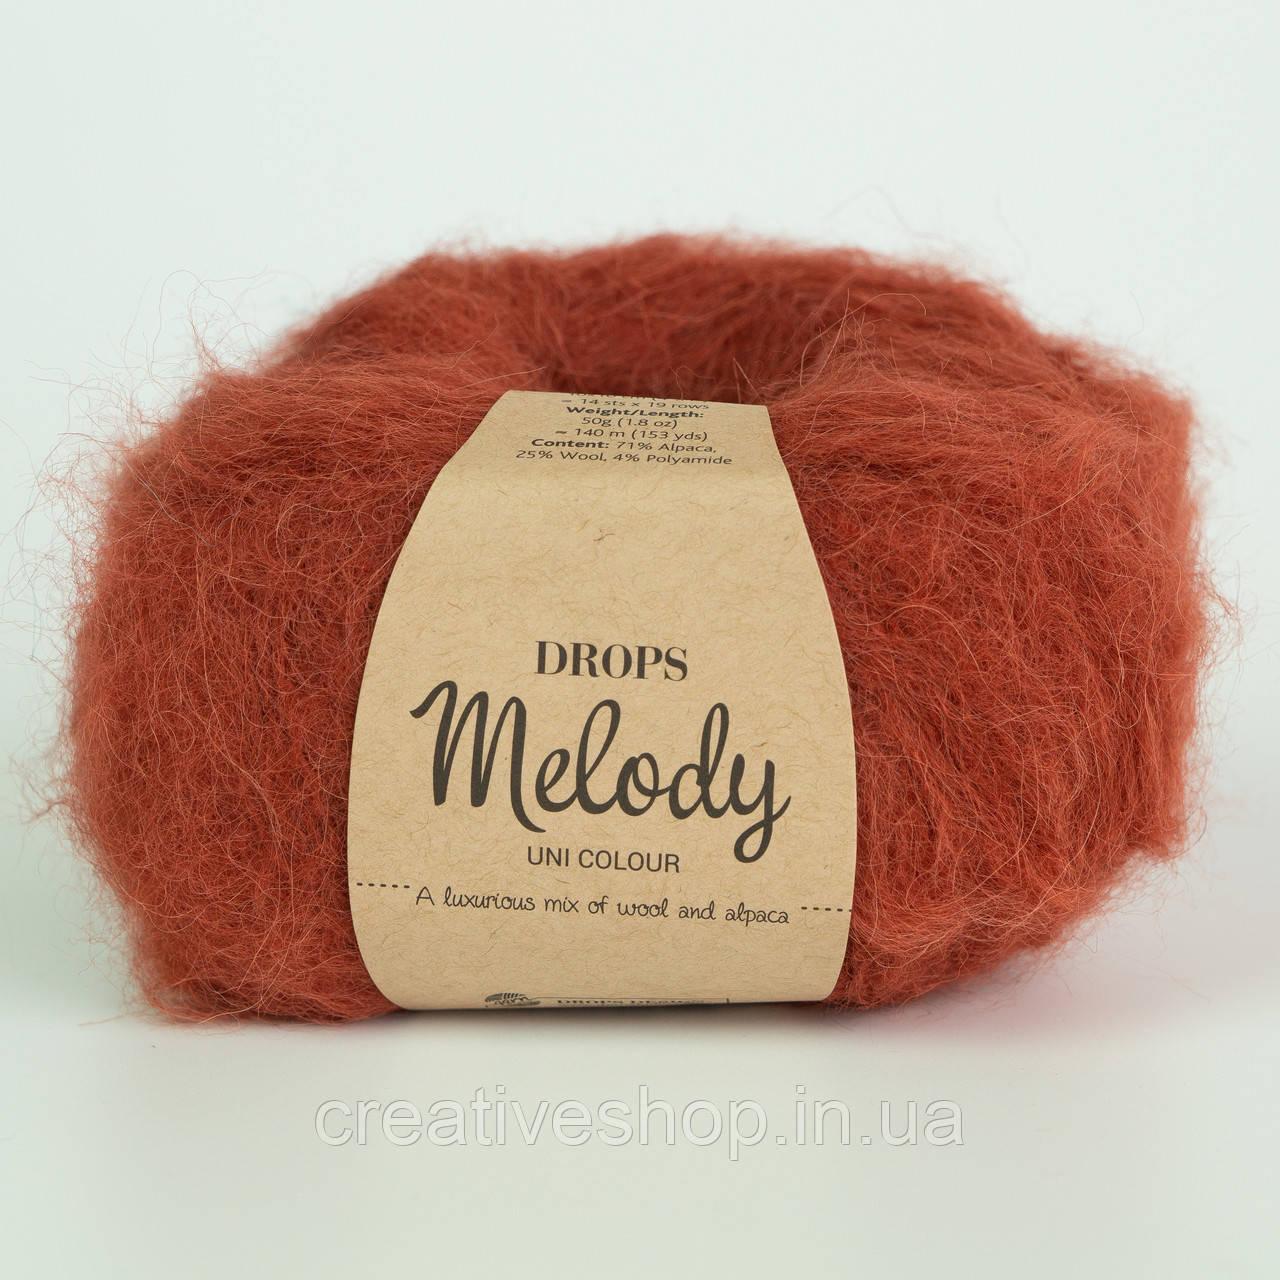 Пряжа Drops Melody (колір 19 brick)